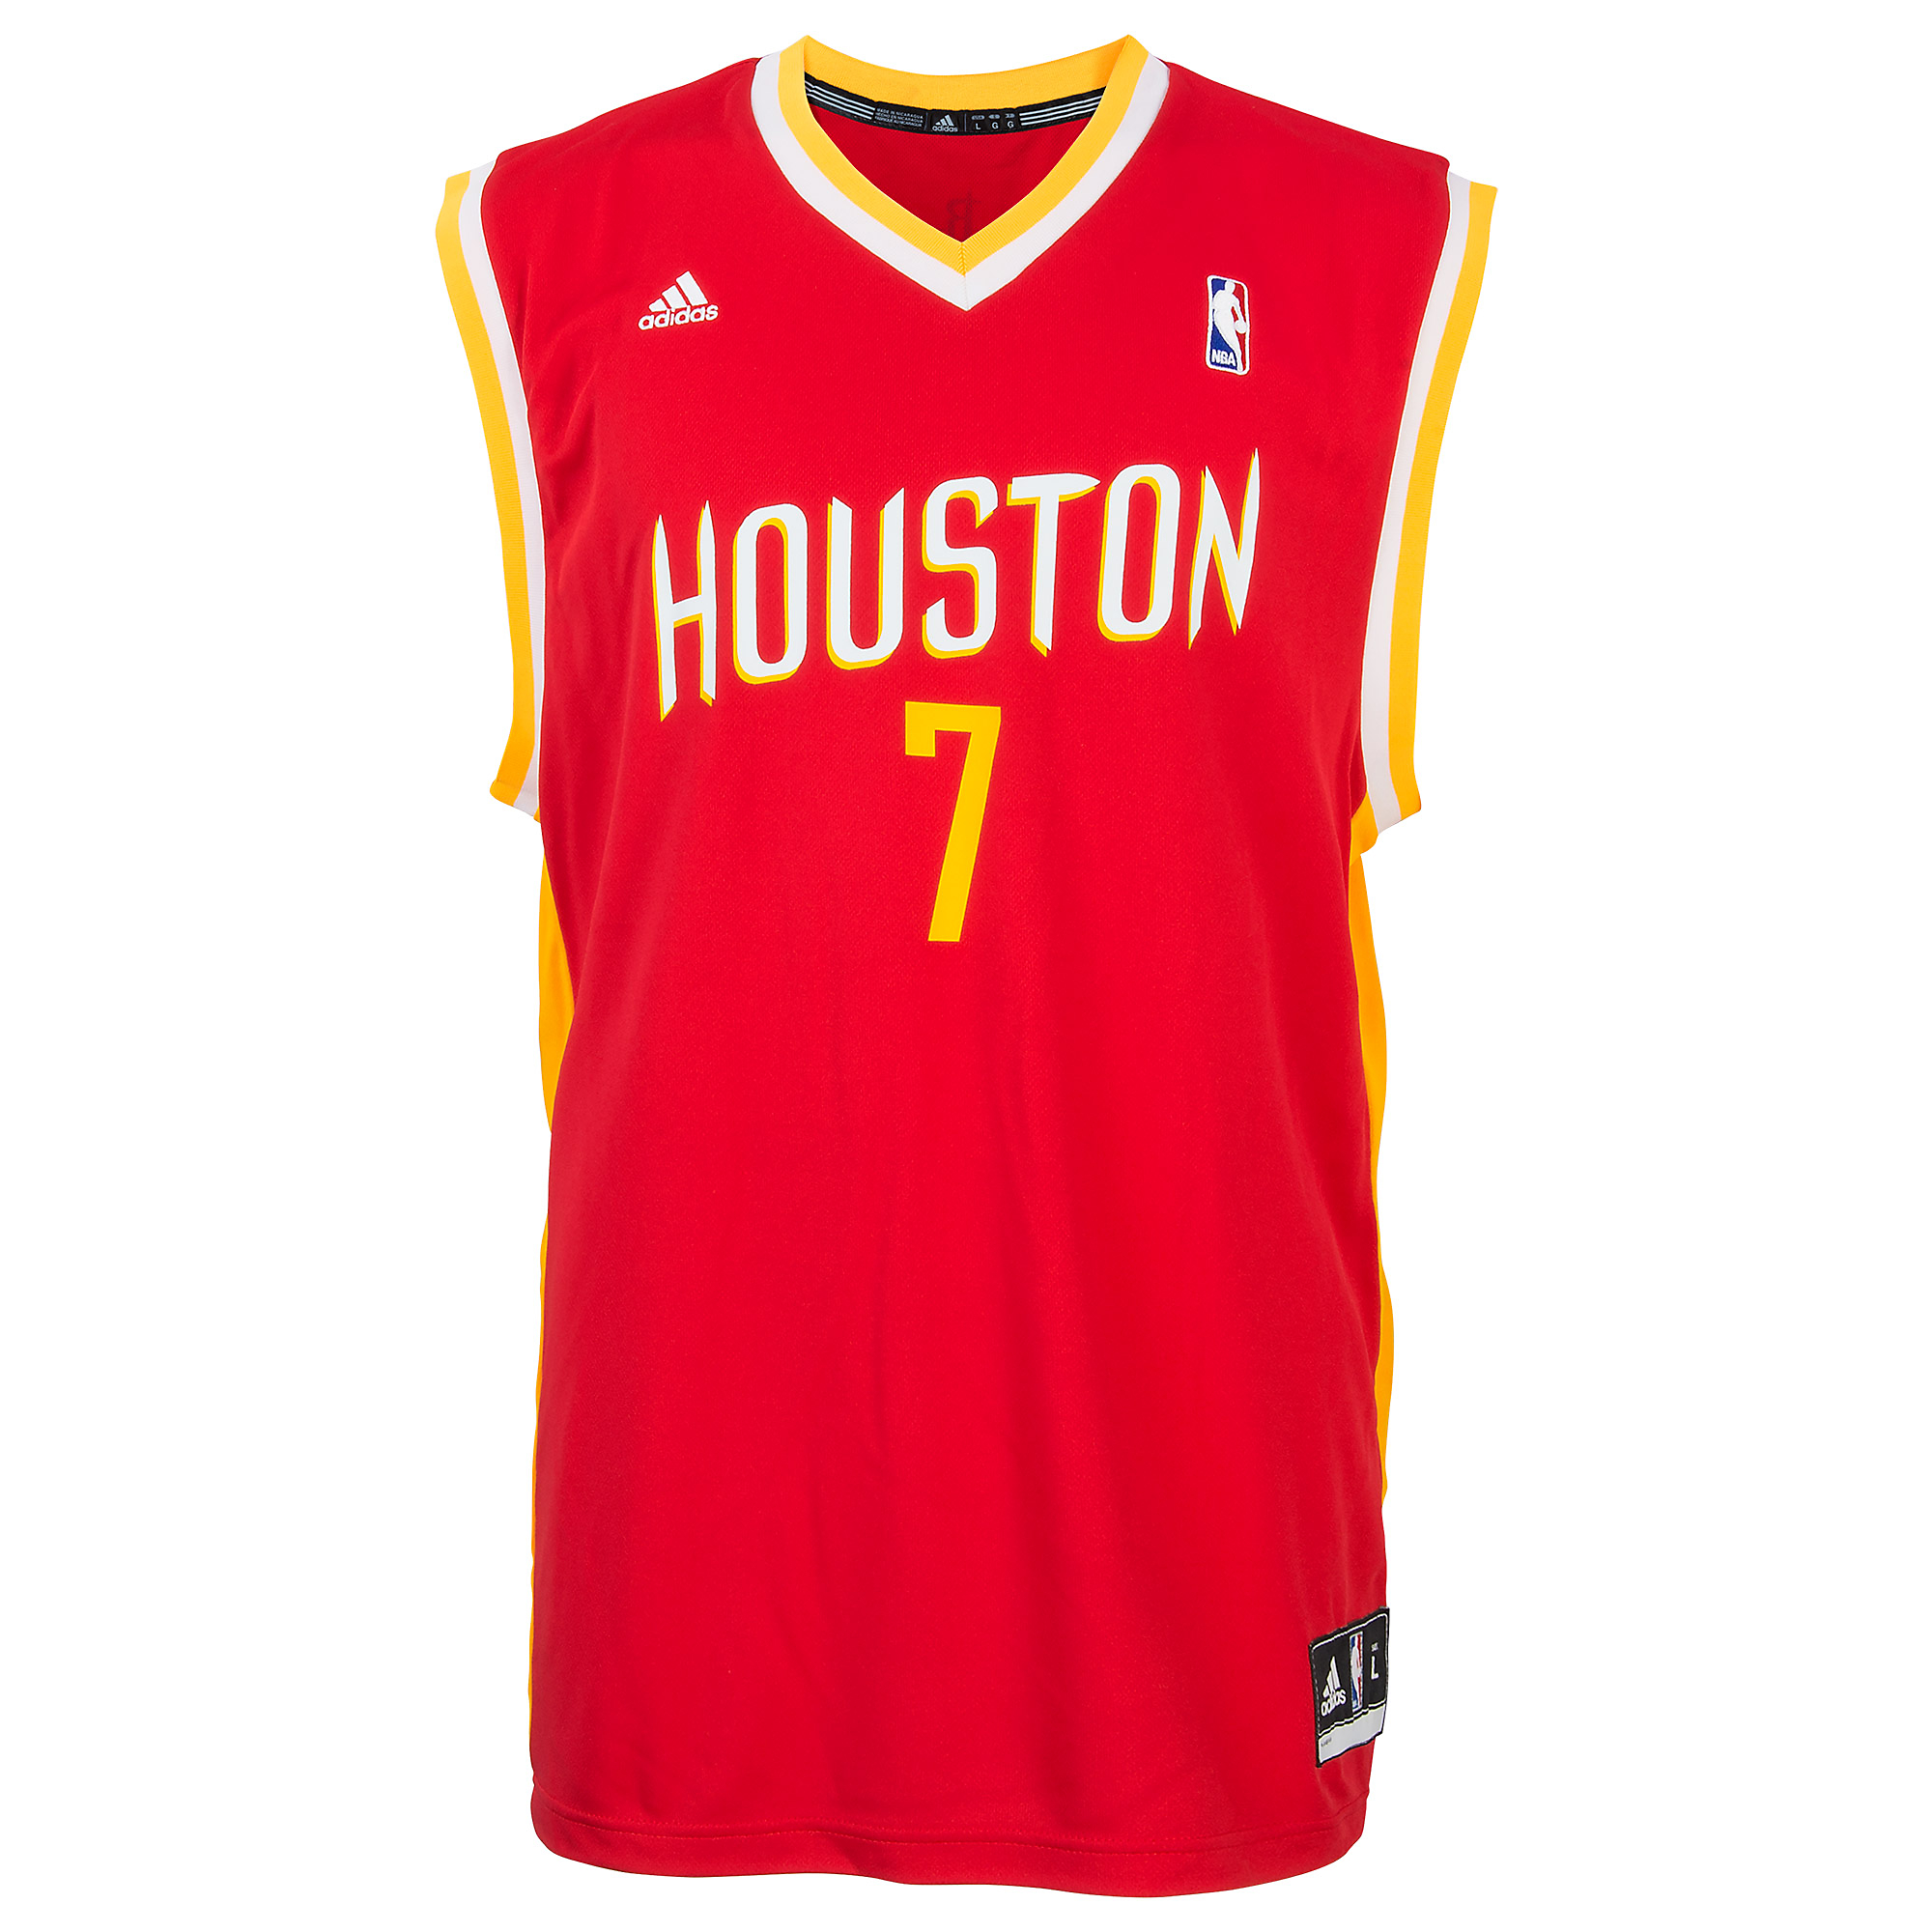 official photos fc3e3 3cdcf Houston Rockets Jeremy Lin #7 Adidas Replica Jersey | Fans ...